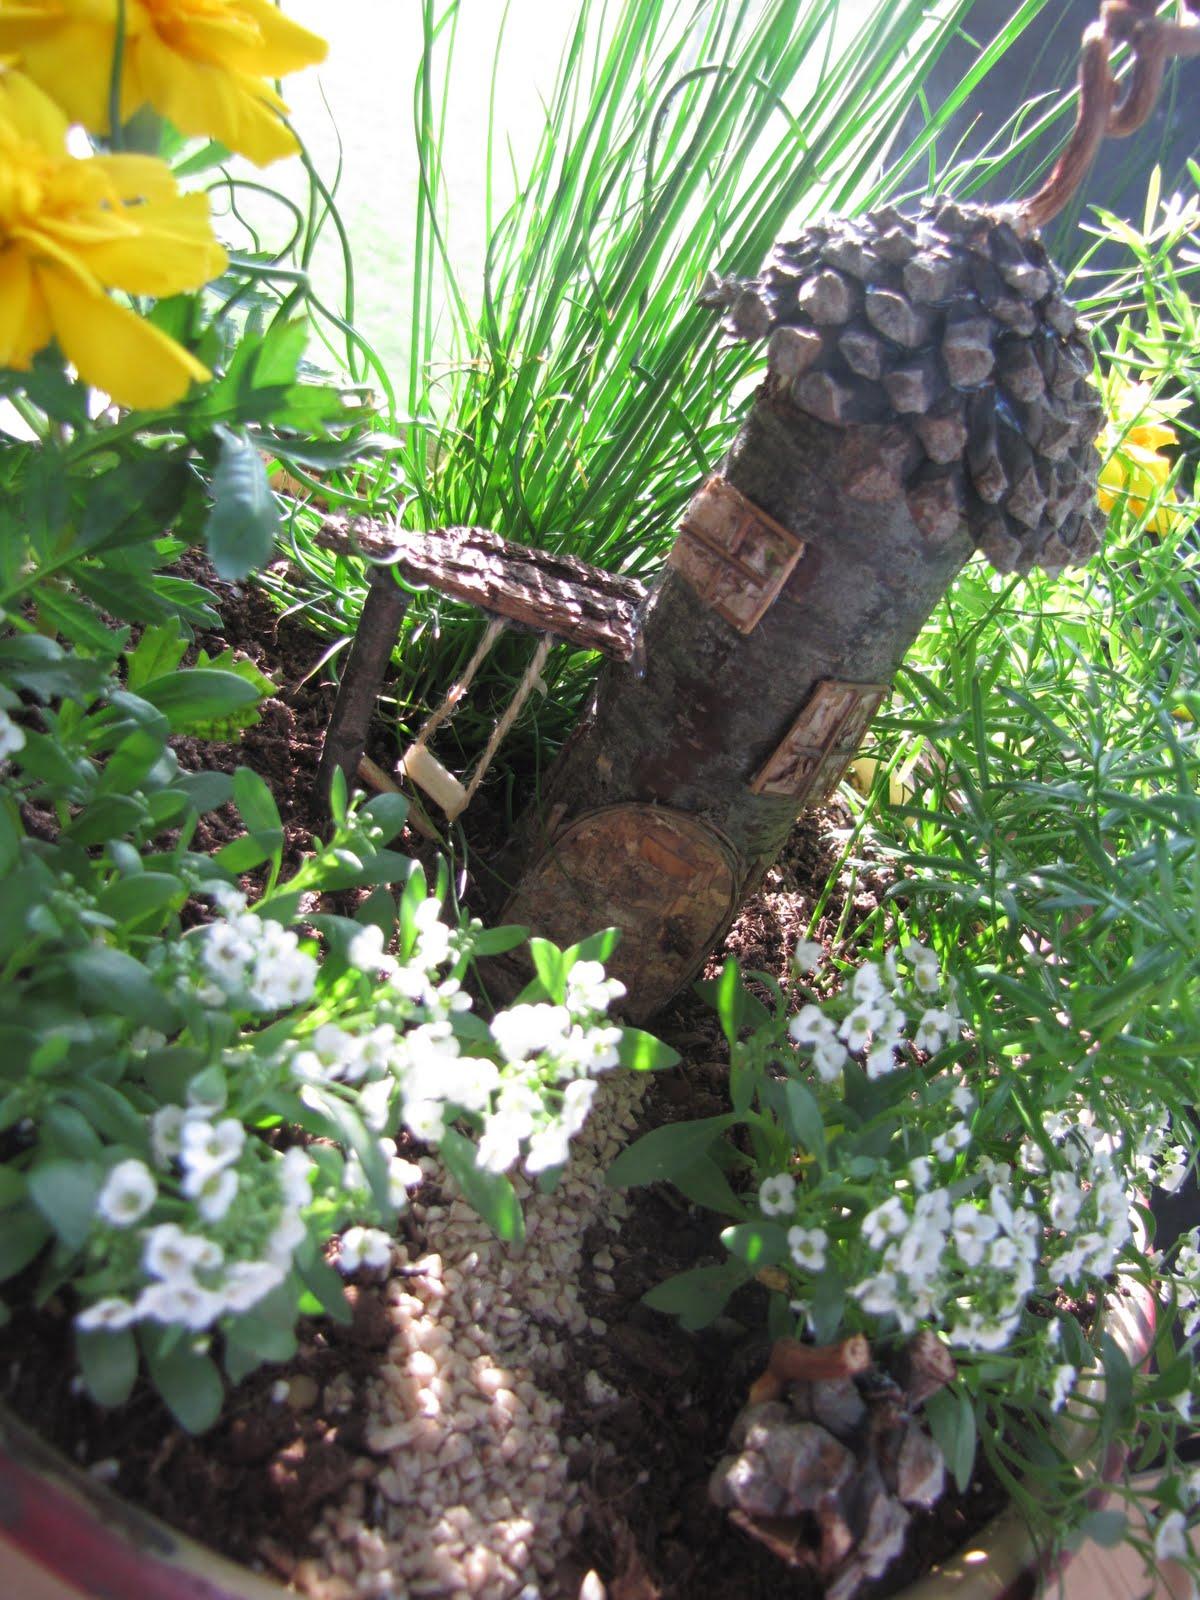 Fancilicious Fairylands Fairy Gardens And Gypsy Carvan